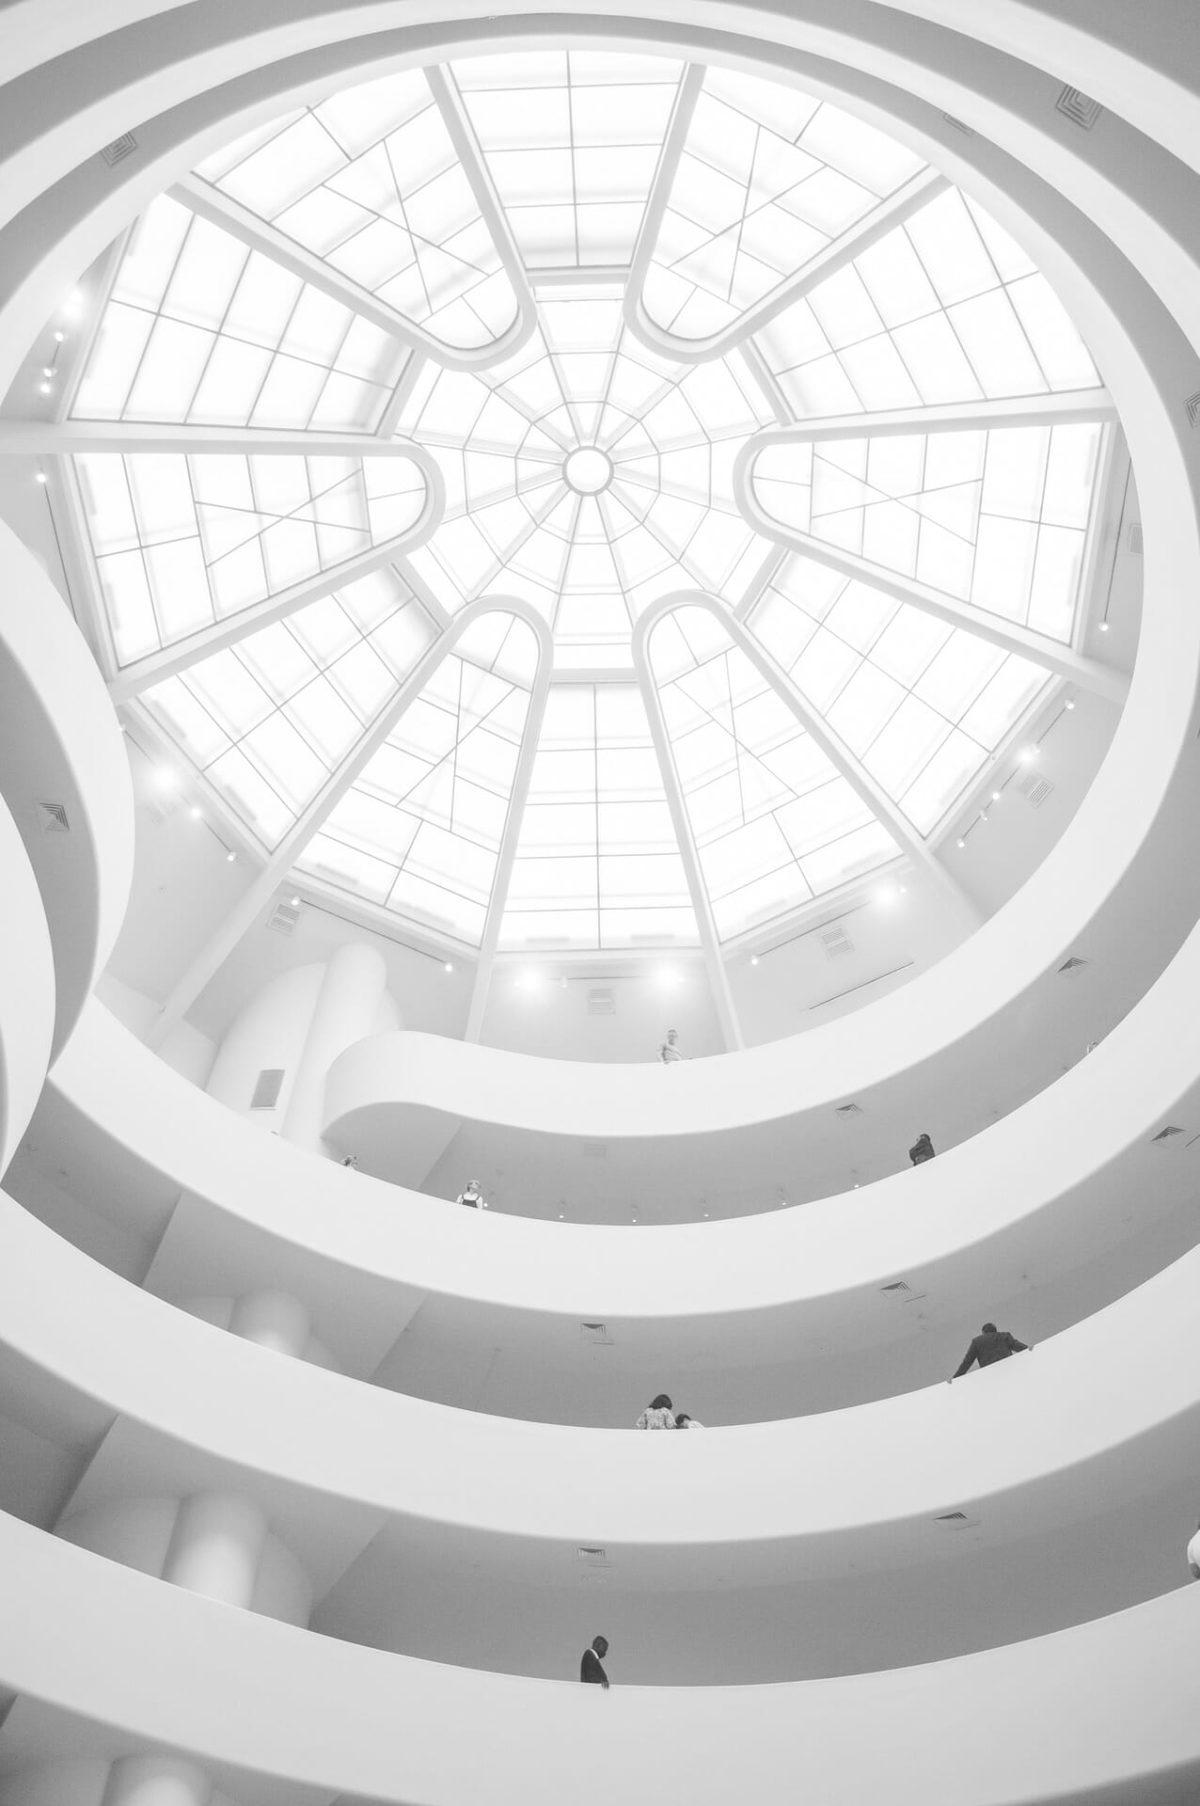 Guggenheim Pixabay Public Domain